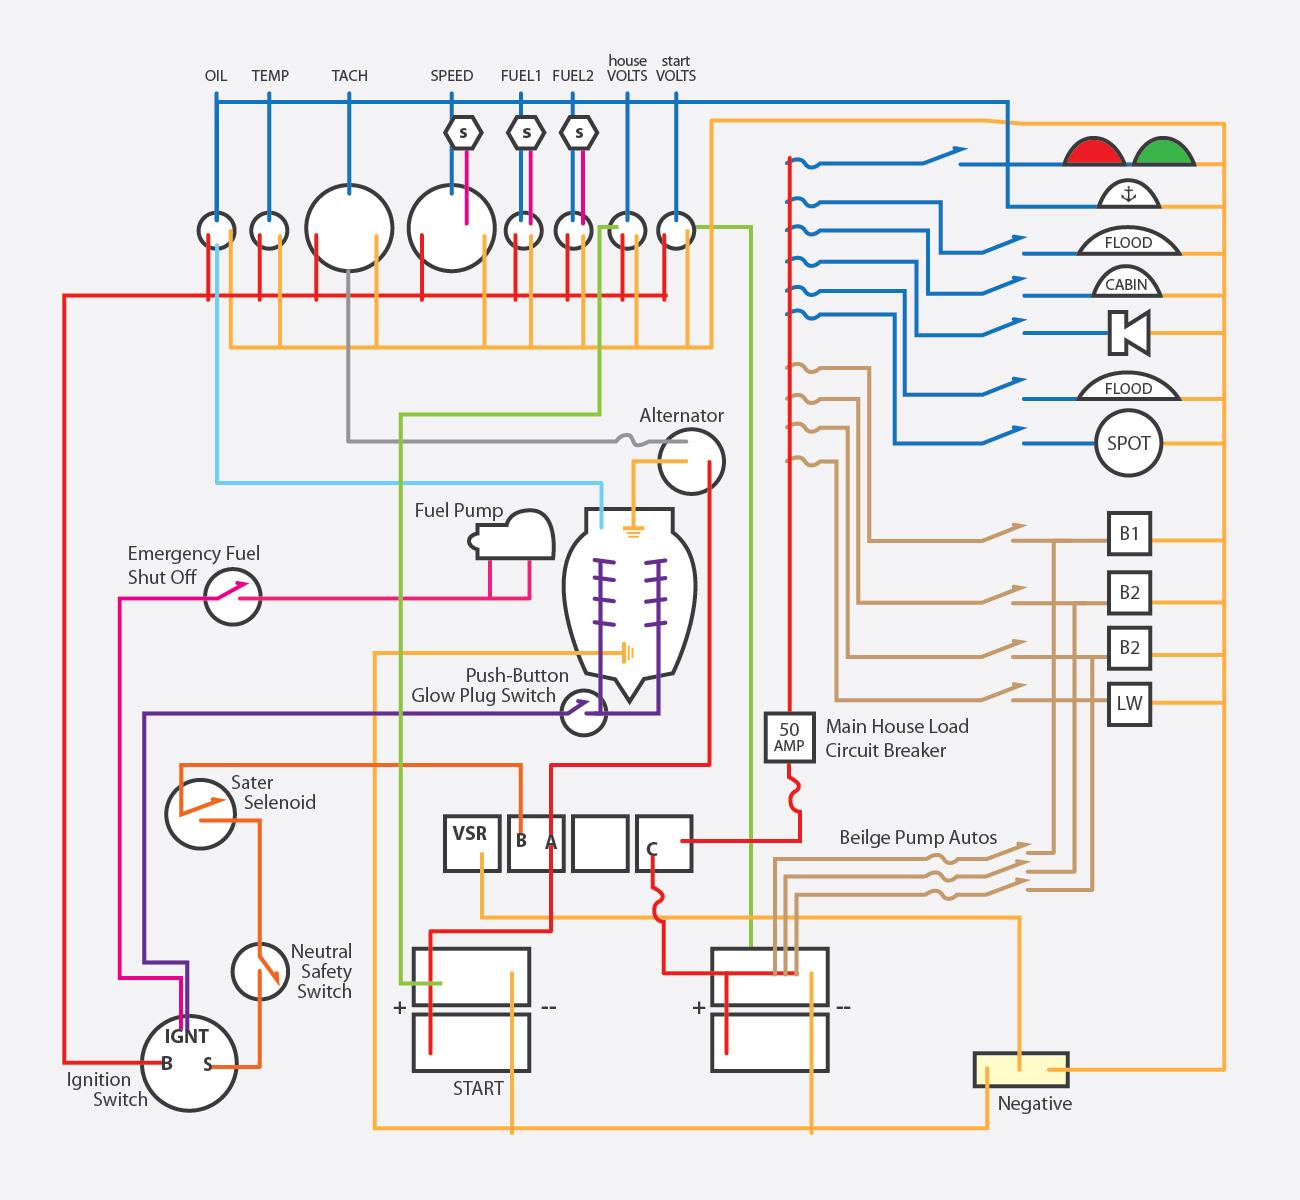 Houseboats Wiring | Wiring Diagram - Boat Wiring Diagram